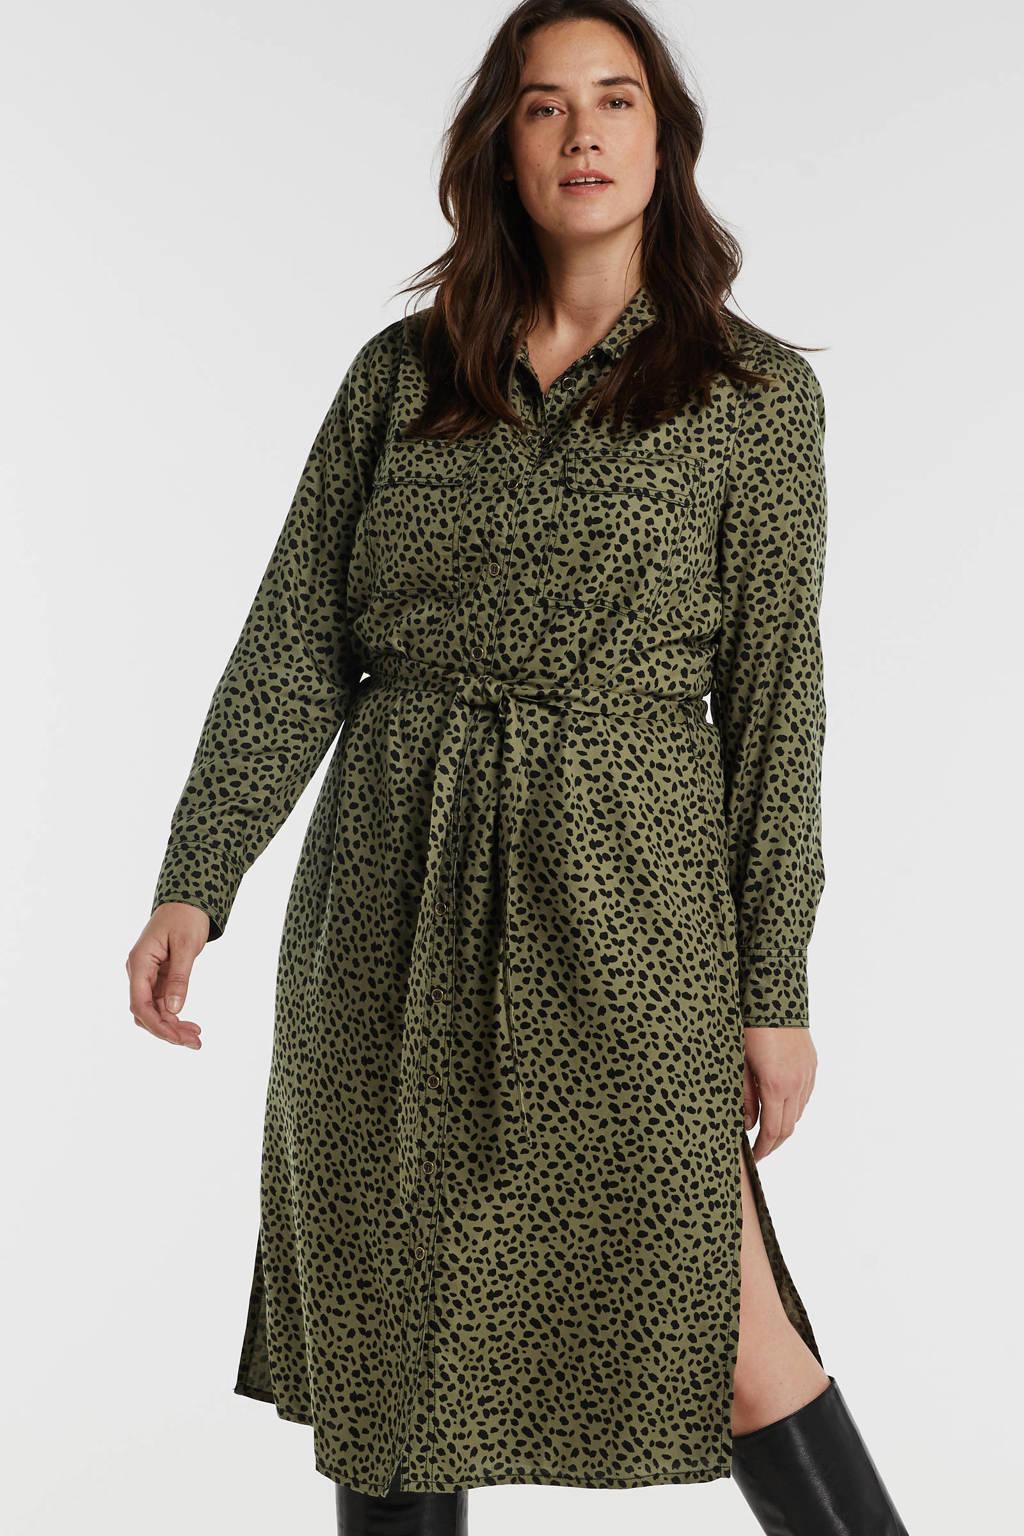 anytime blousejurk Plus size van viscose-tencel met panterprint groen, Groen/zwart